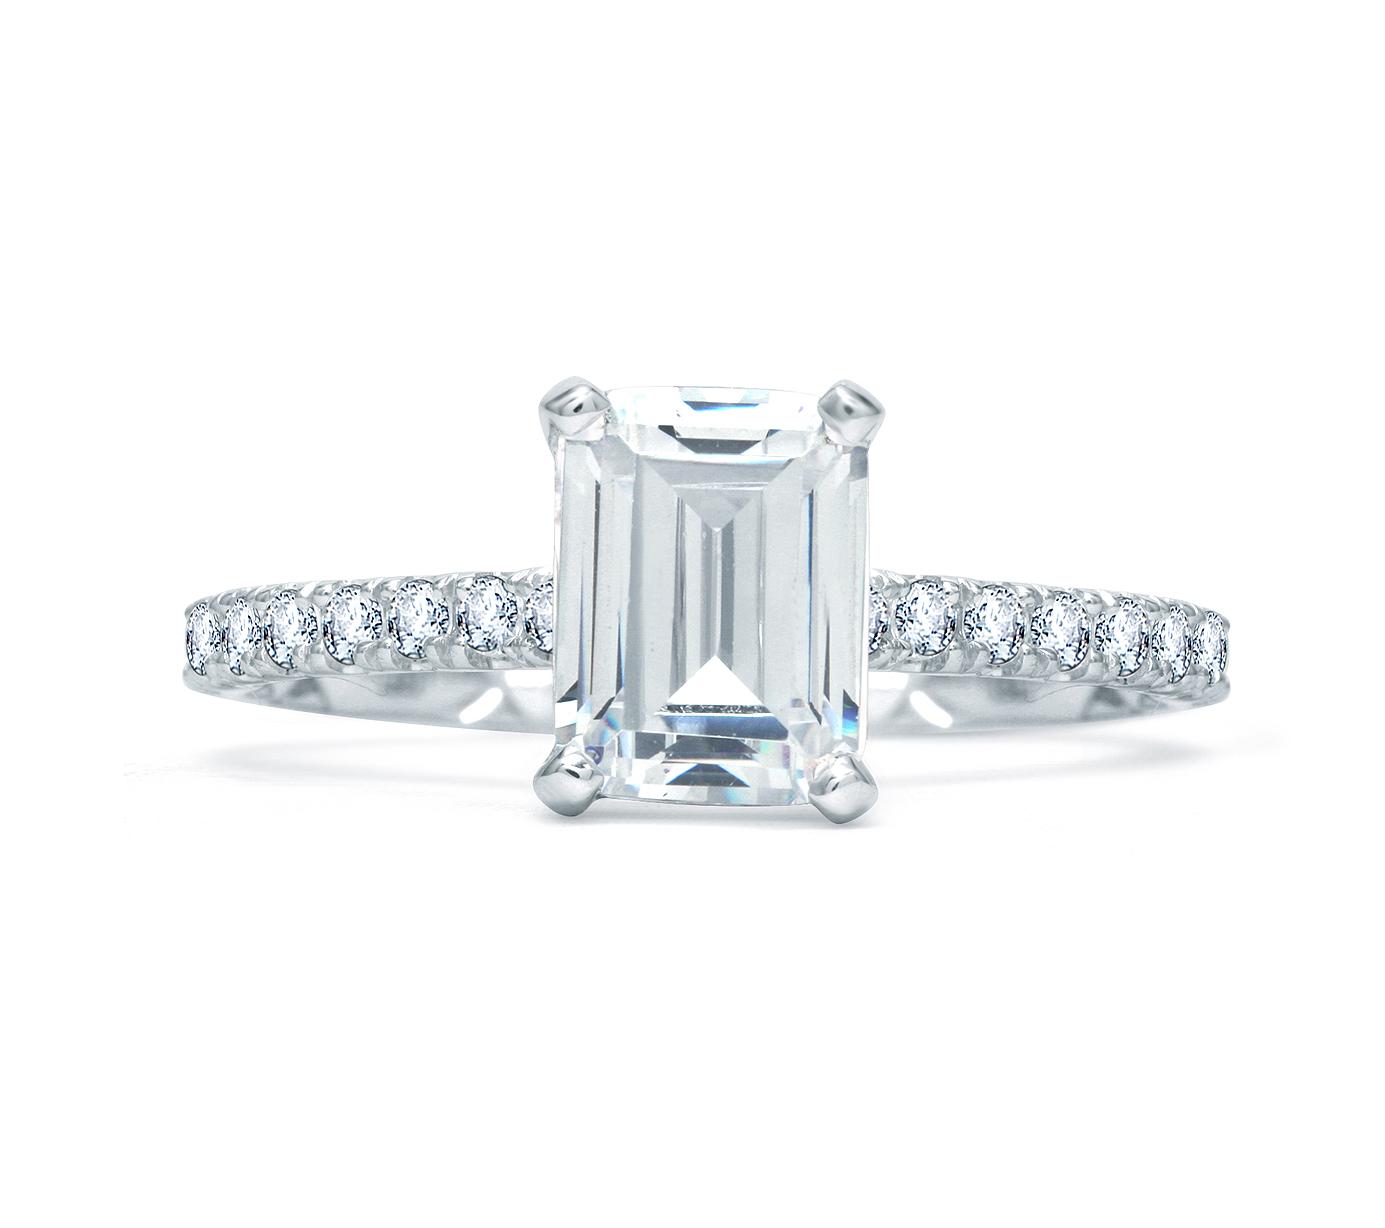 A.Jaffe Rings | Van Gundys | Camarillo, CA Jewelers